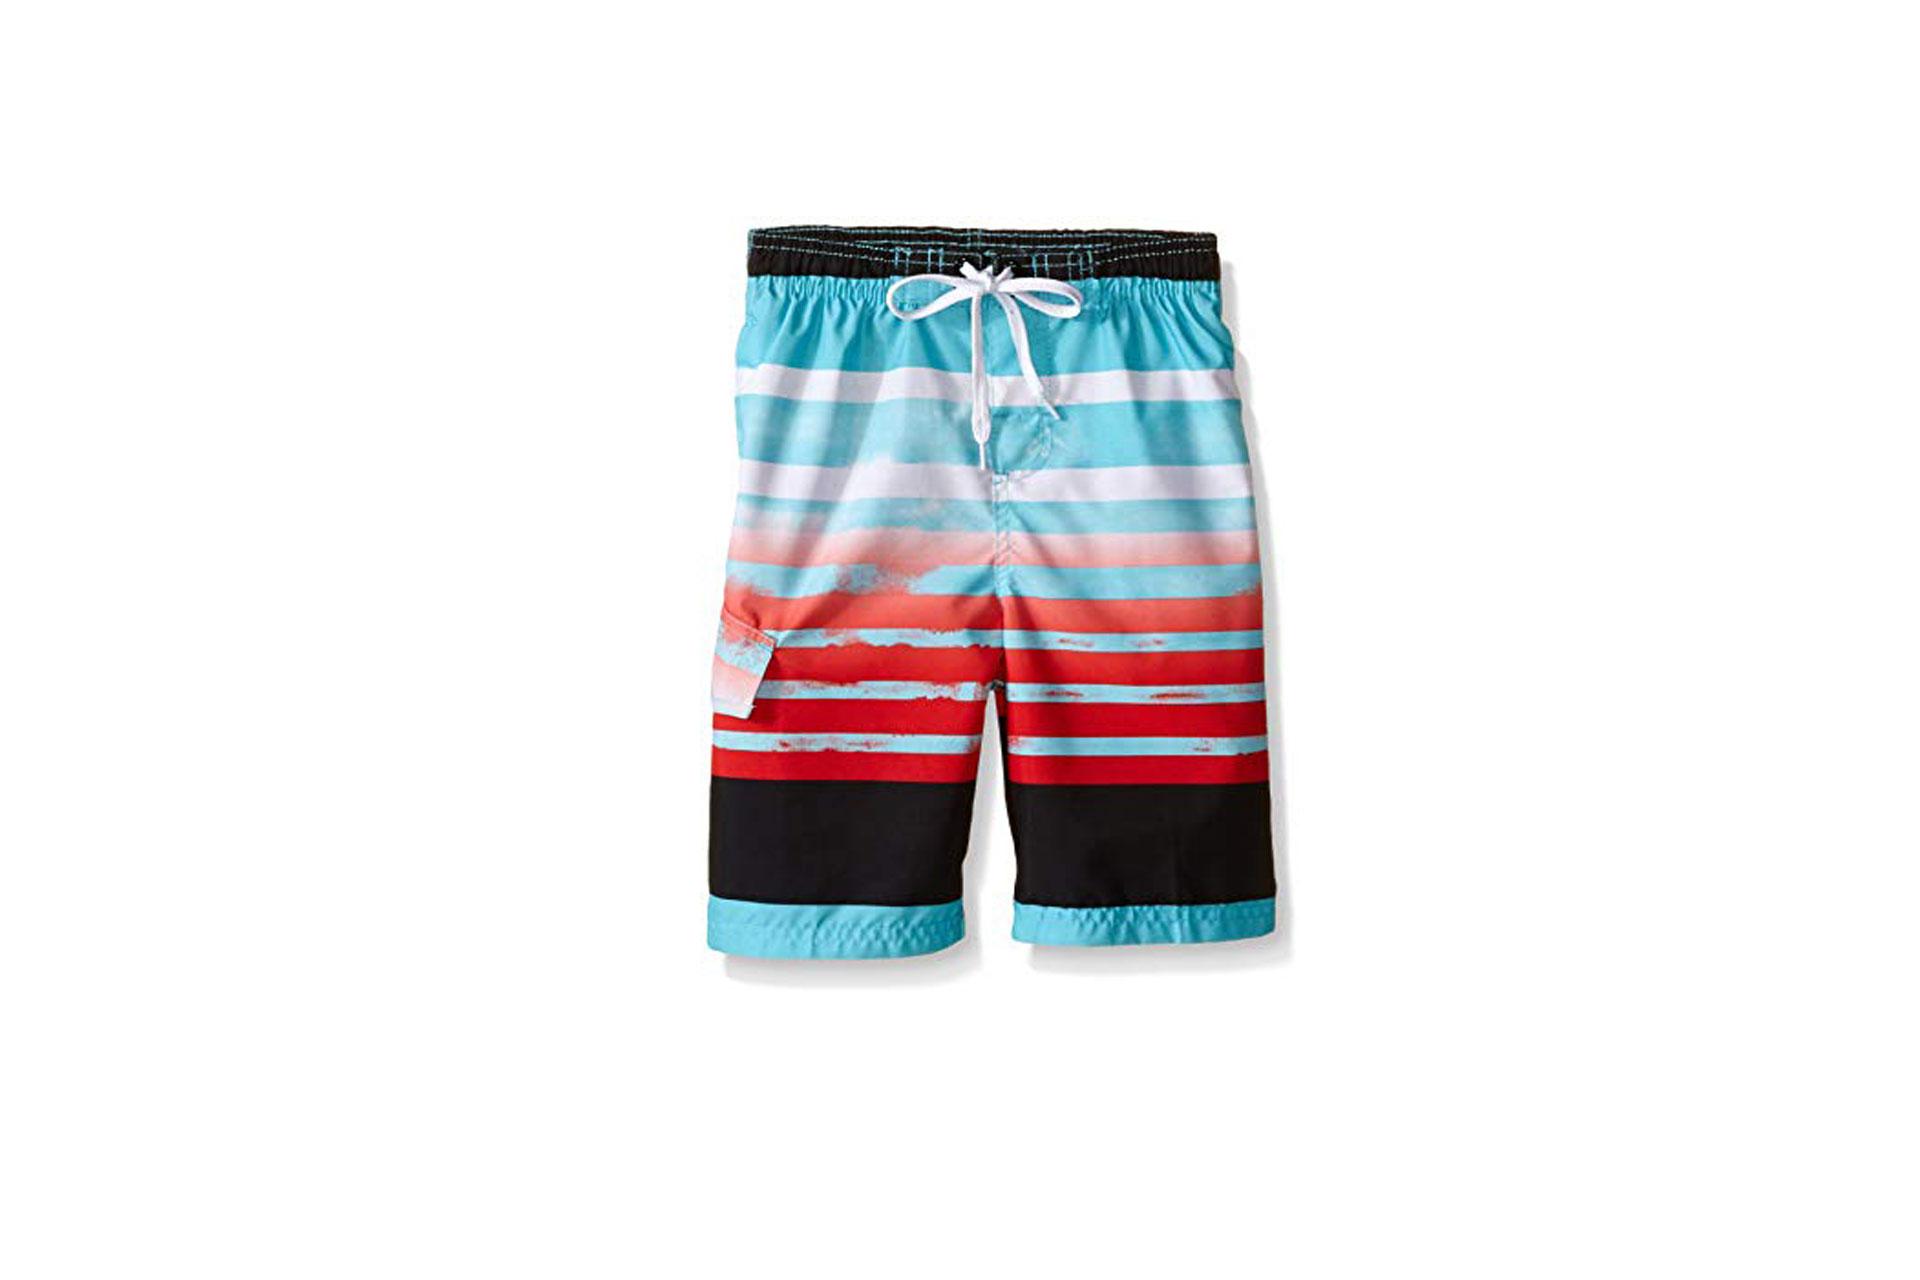 Boys Swim Trunks; Courtesy of Amazon